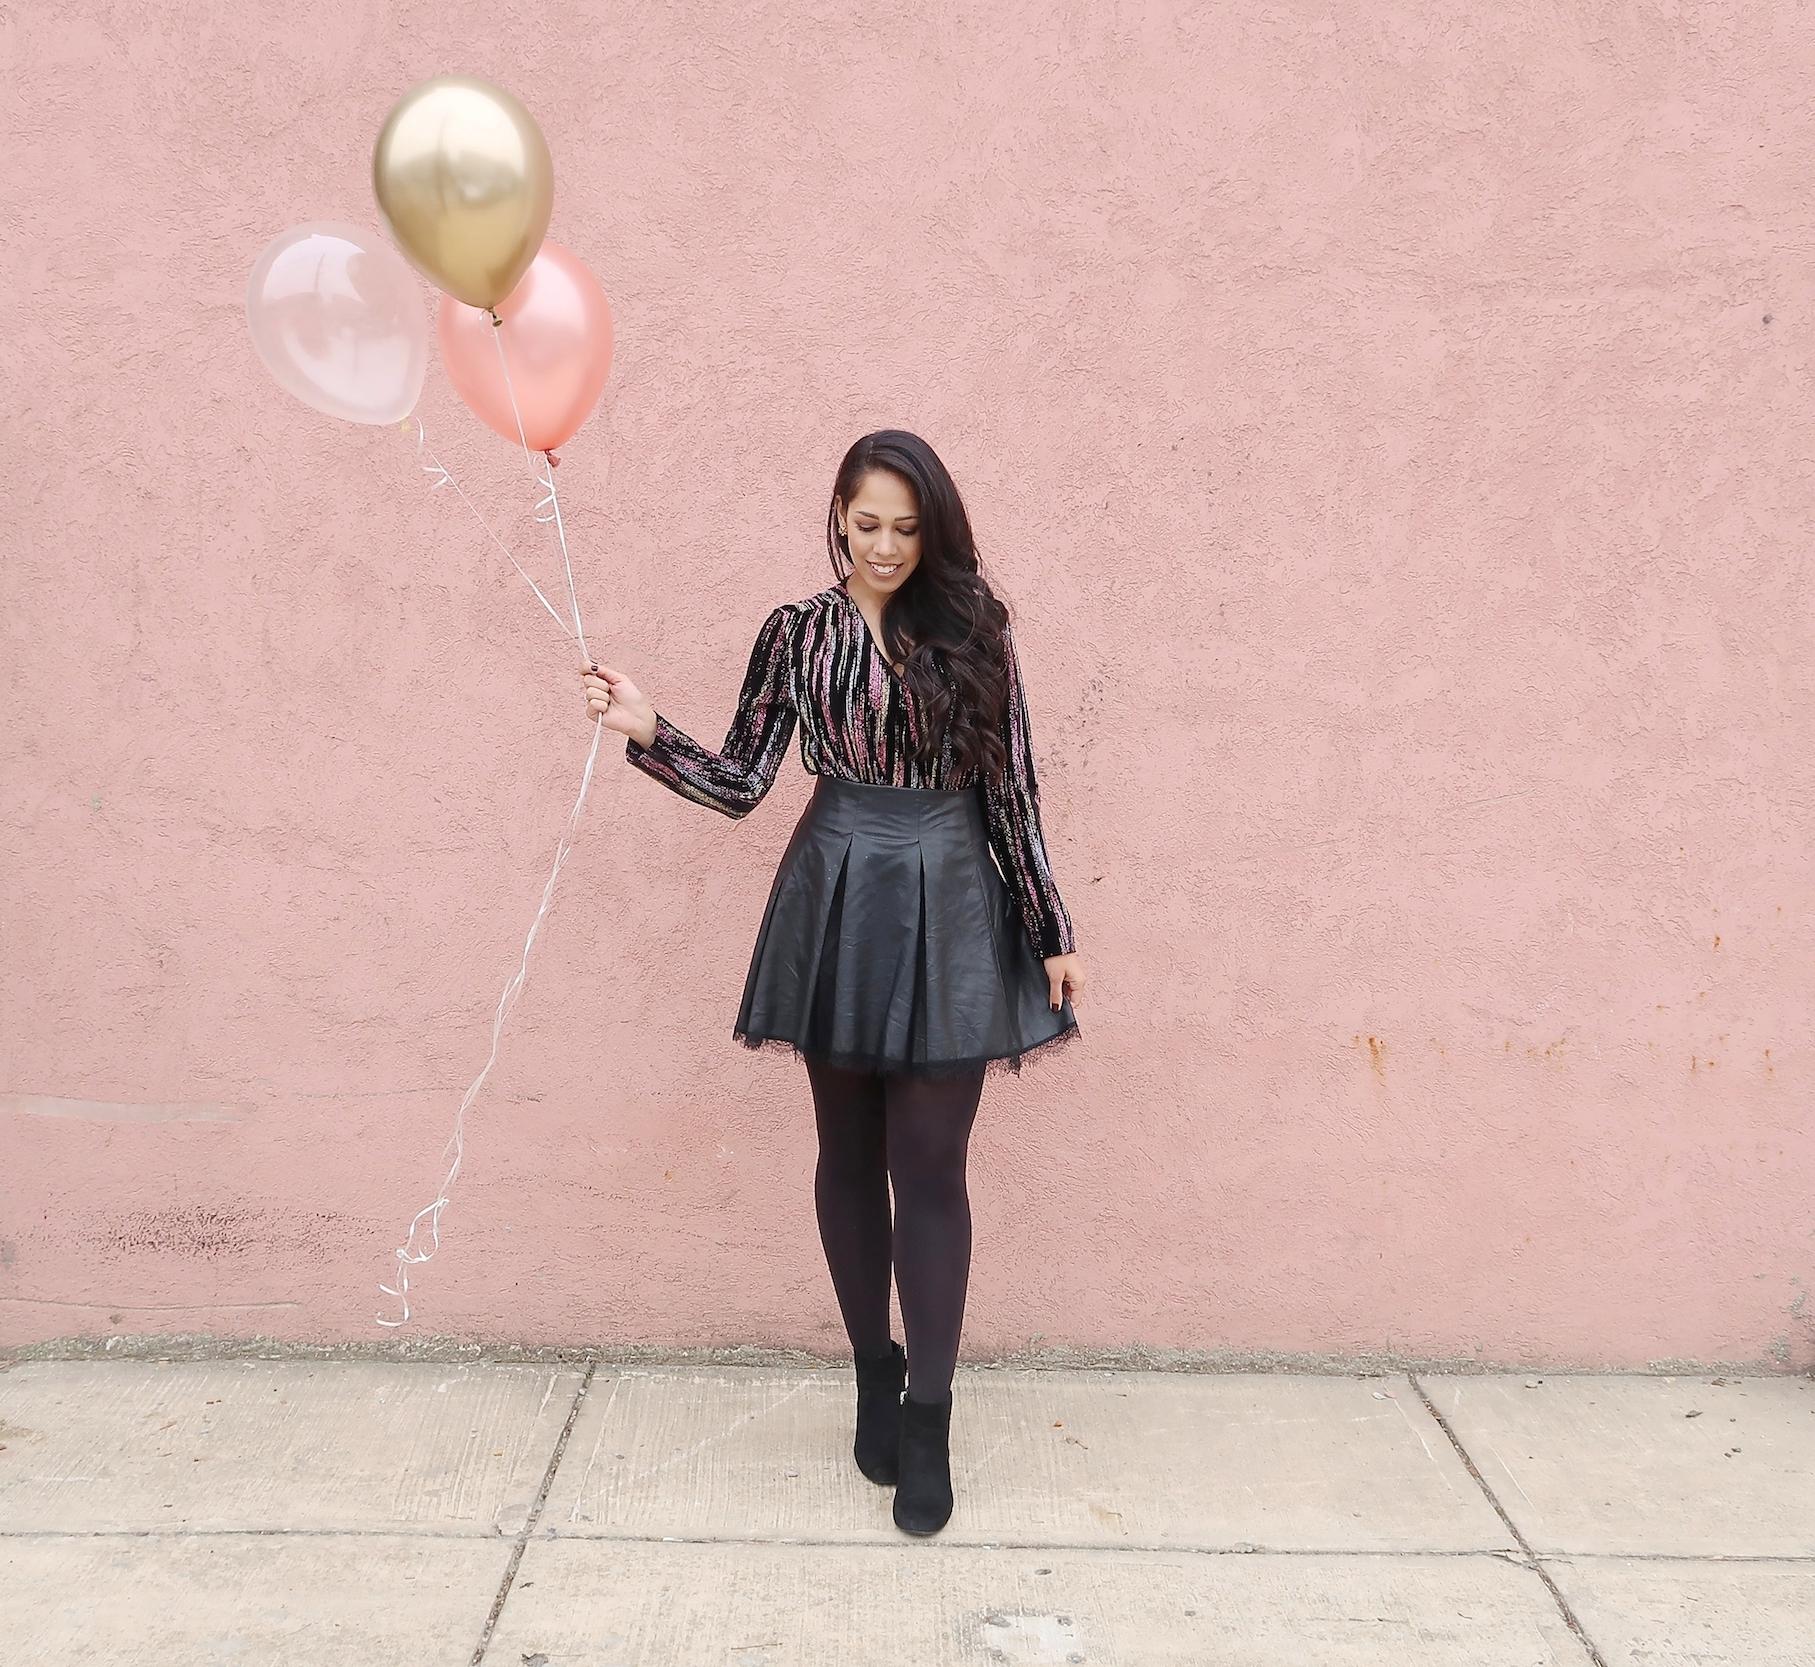 holiday-outfit-birthday-blogger-ideas-mygoldenbeauty.JPG